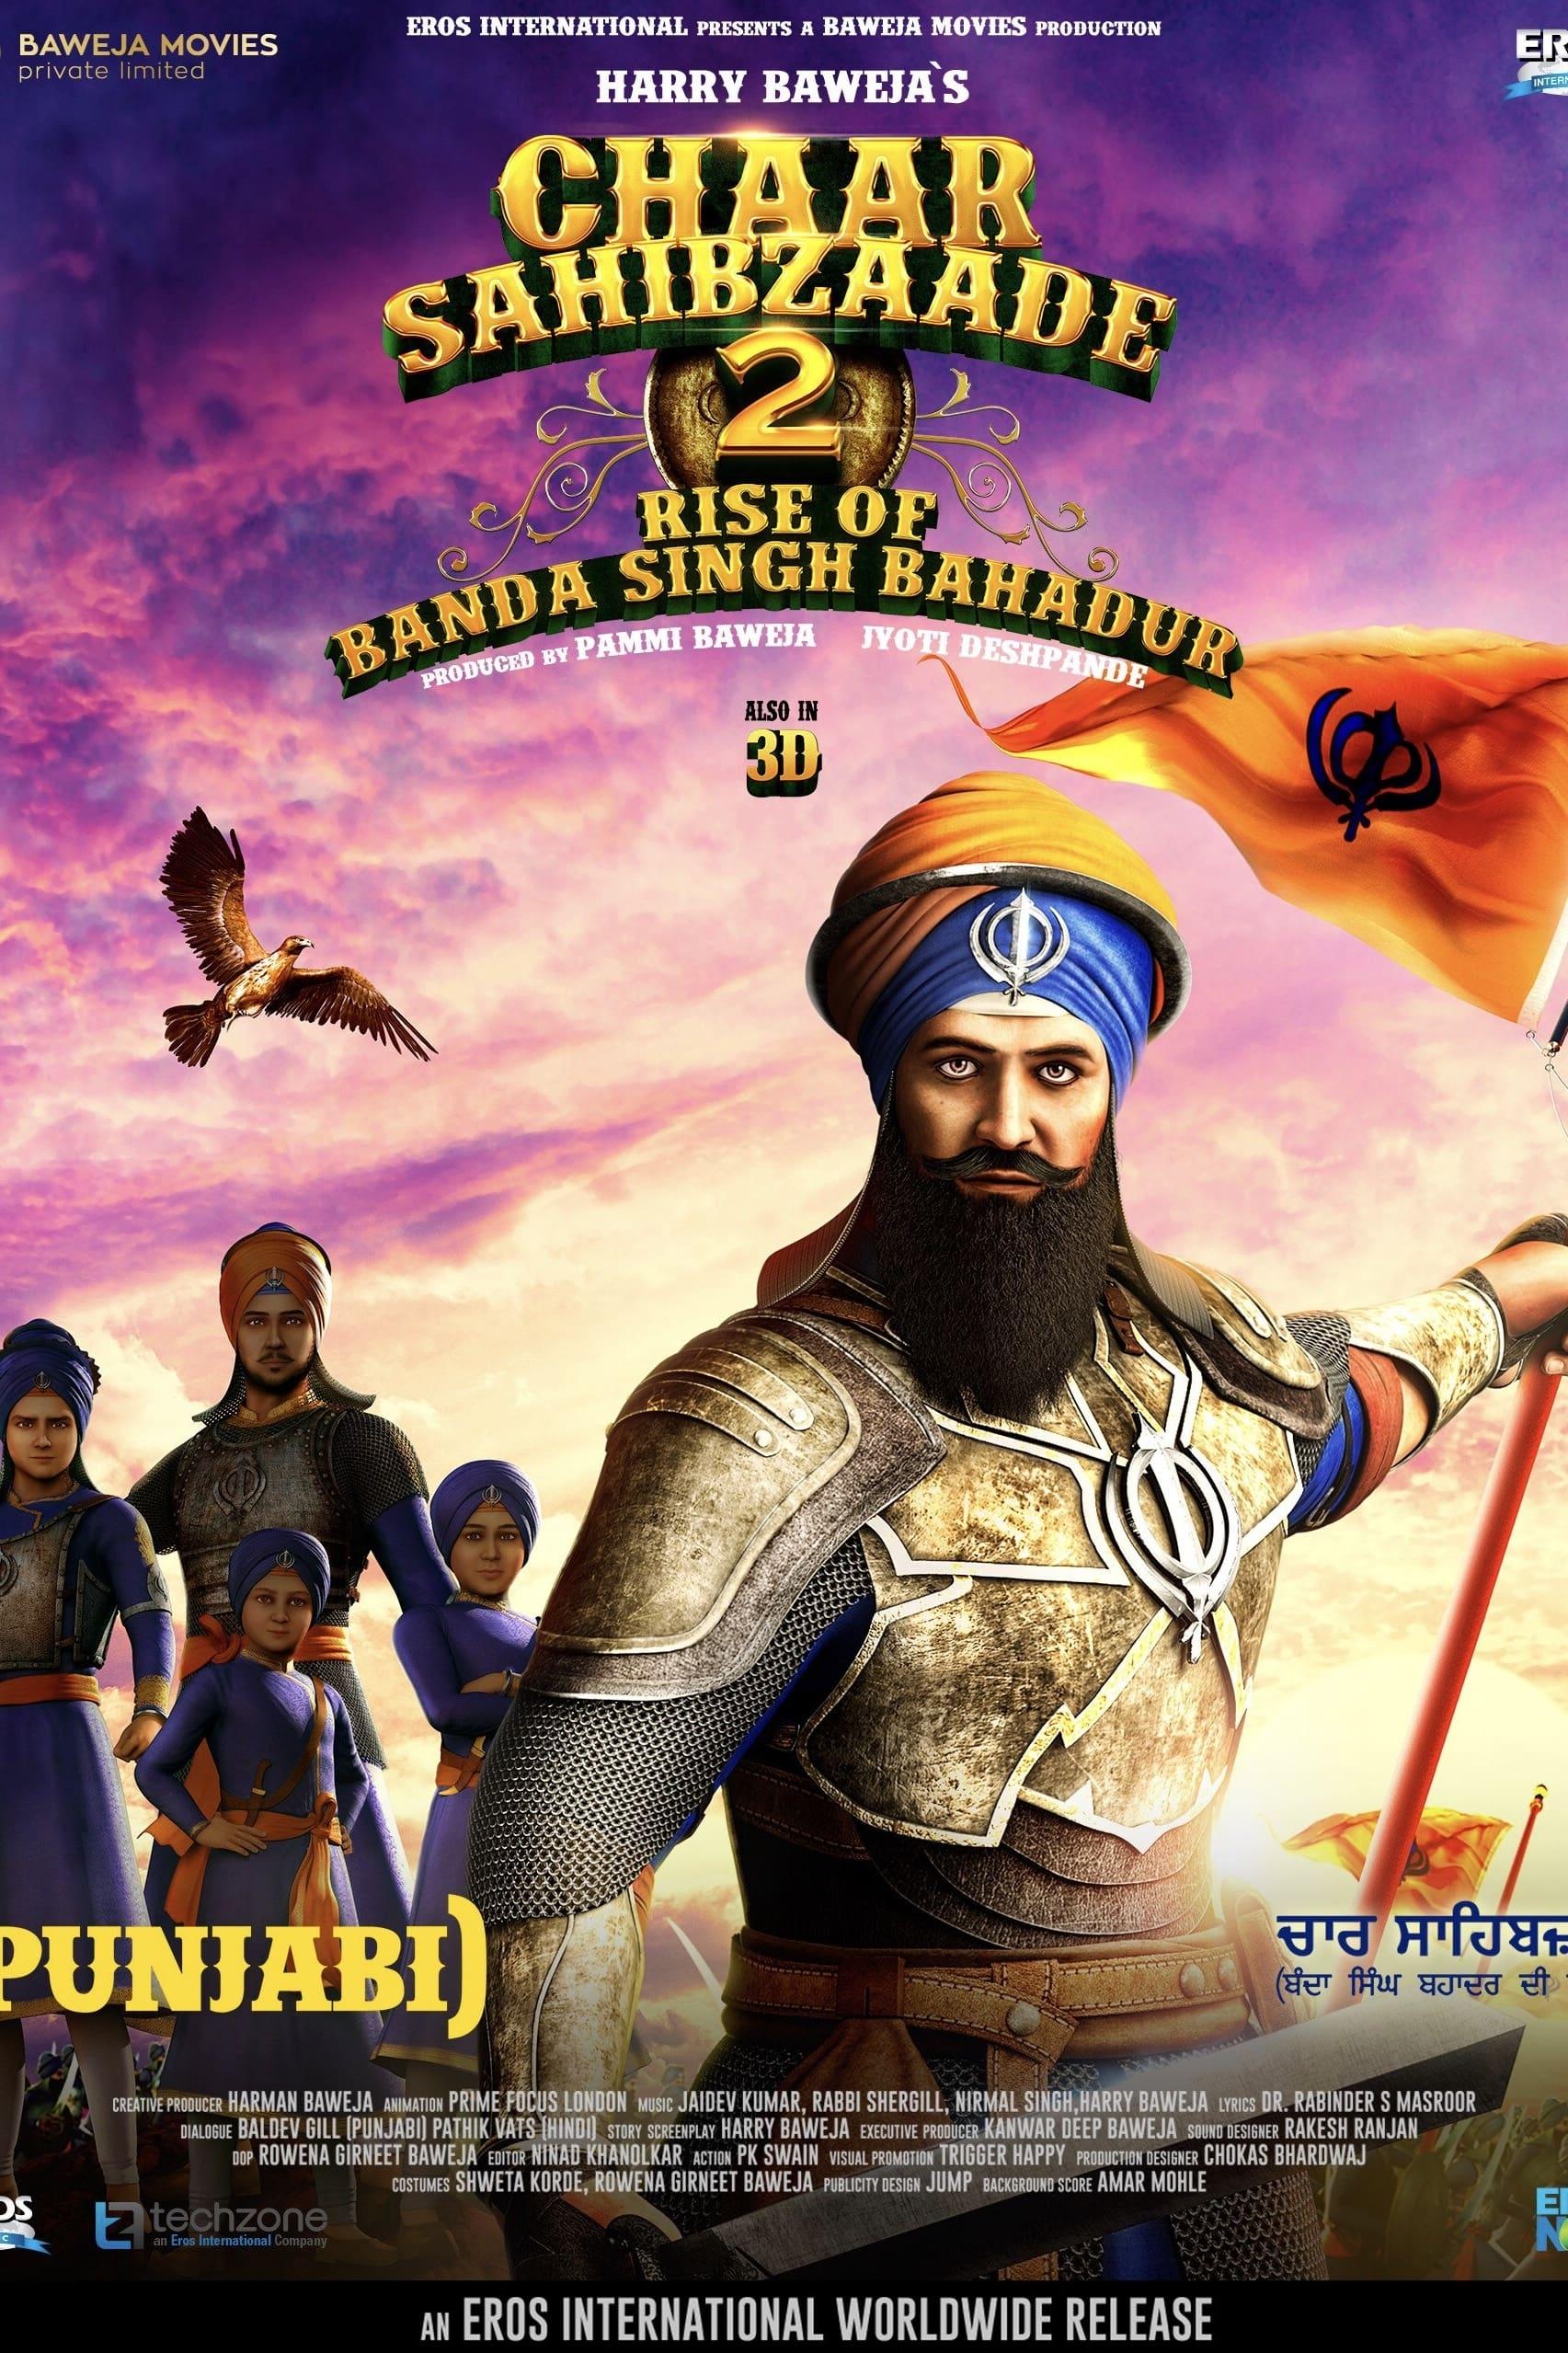 Chaar Sahibzaade : Rise of Banda Singh Bahadur